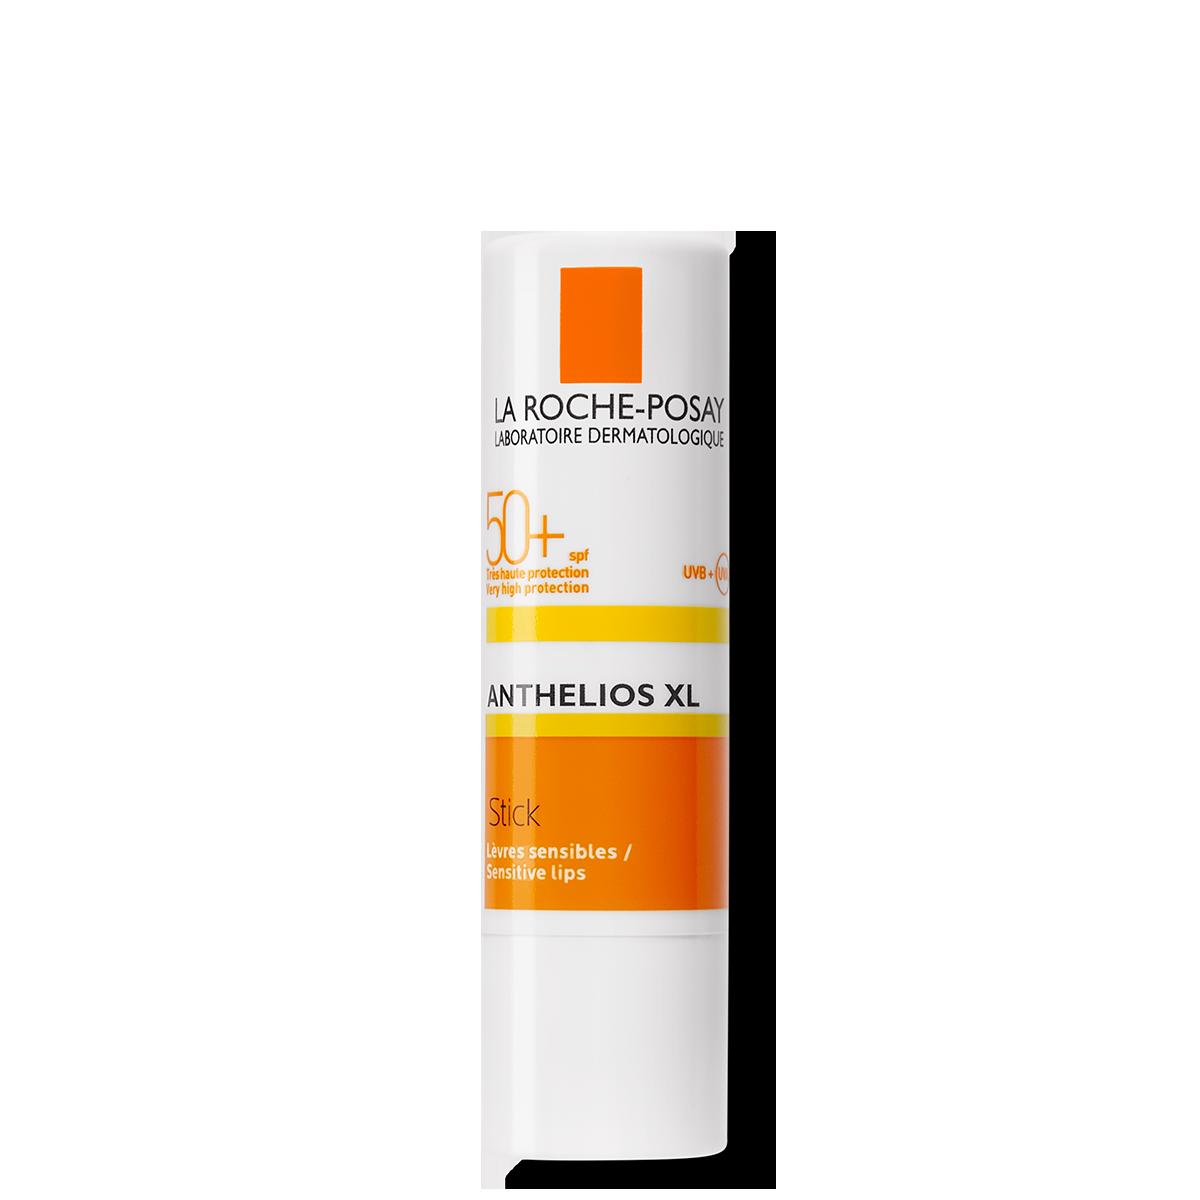 La Roche Posay ProductPage Sun Anthelios XL Lips Stick Spf50 Sensitive